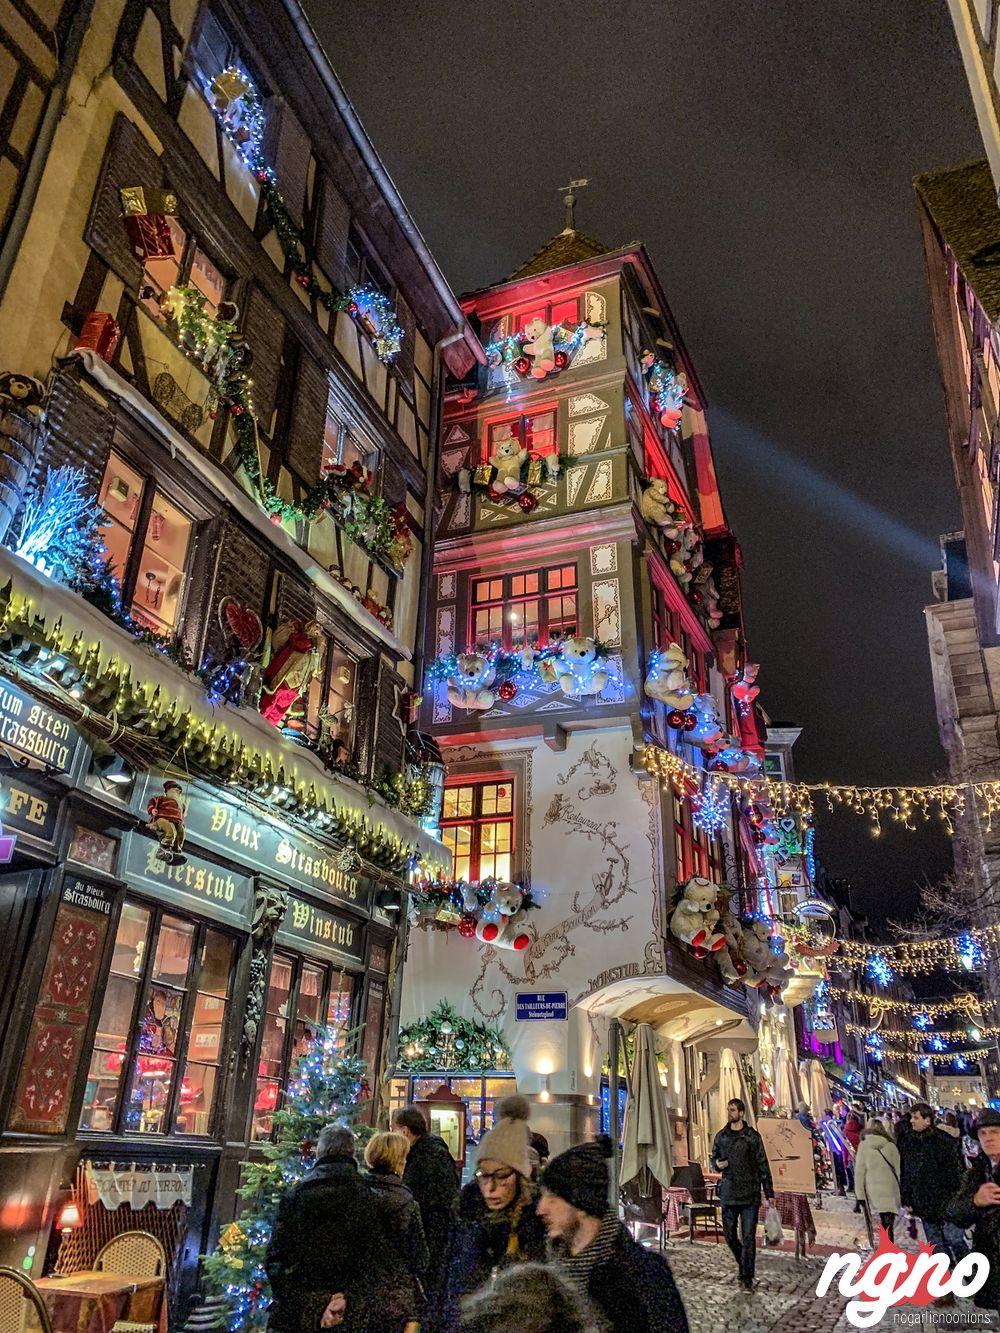 strasbourg-christmas-market-nogarlicnoonions-52018-12-15-09-10-12